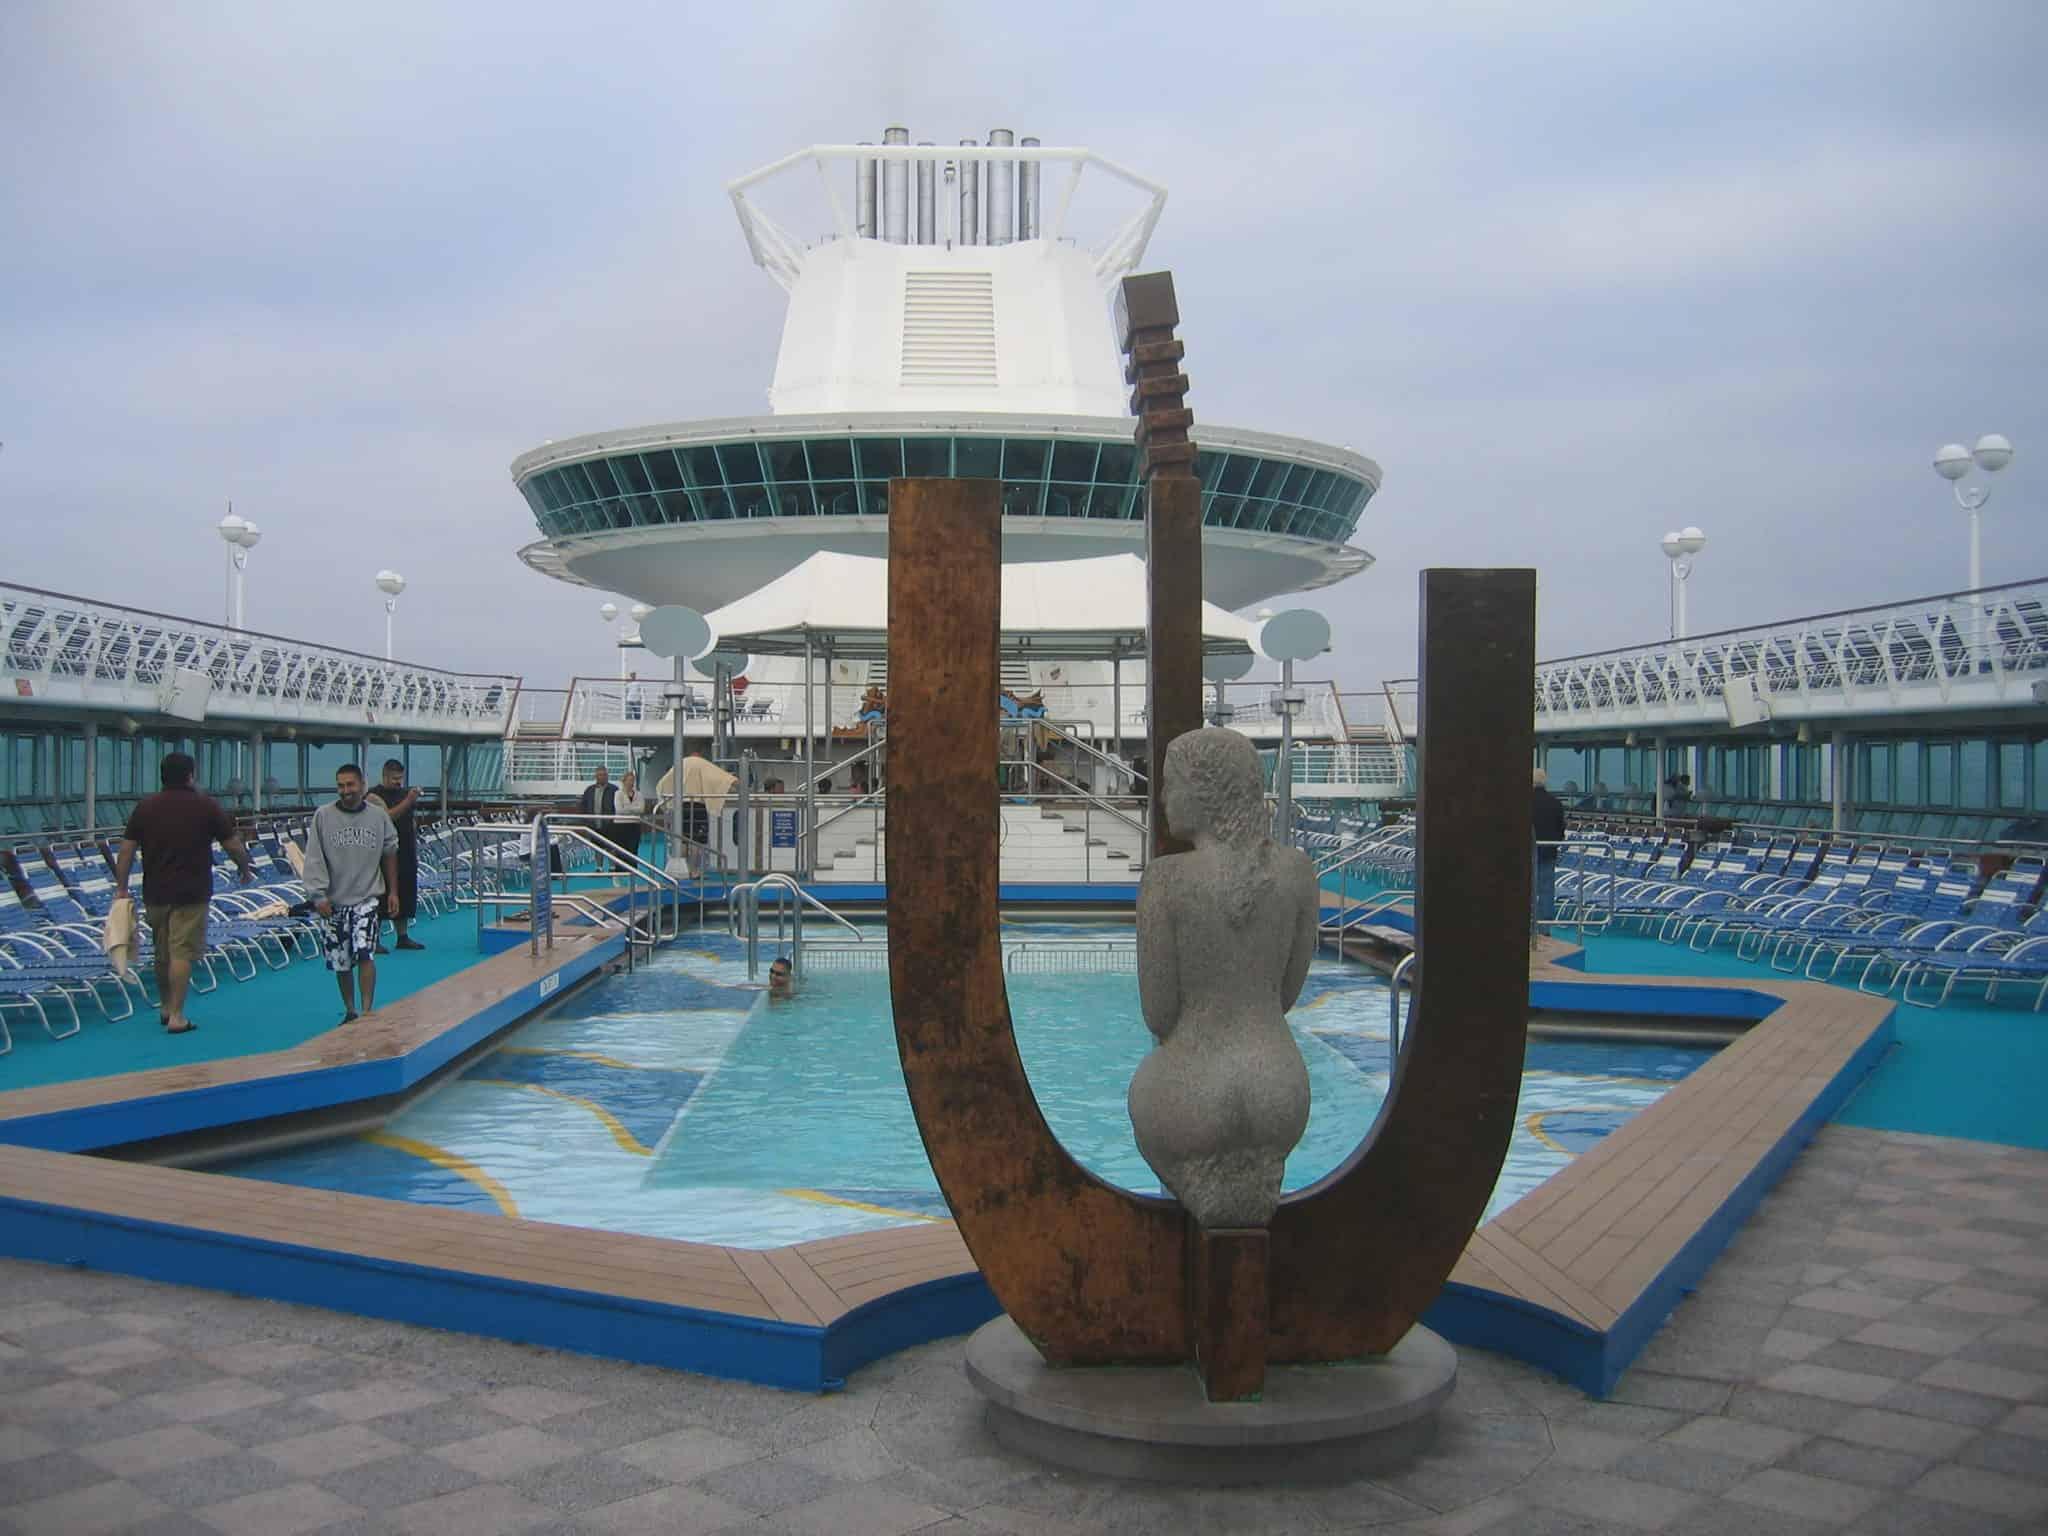 Monarch Lido Pool Royal Caribbean